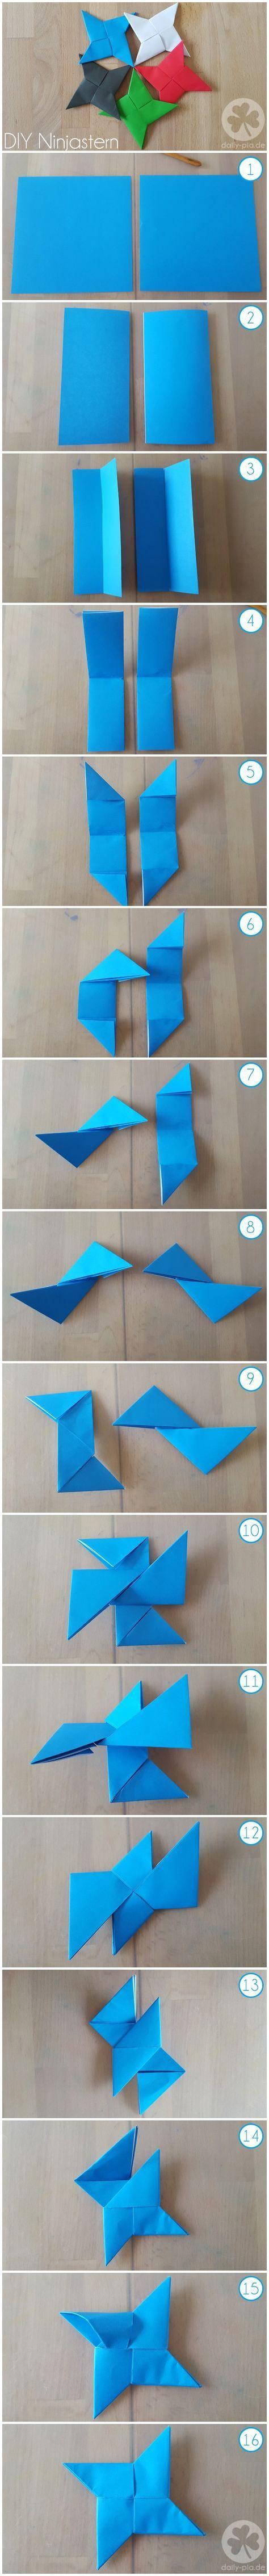 Diy Wurfsternninjastern Origami Crafts Pinterest Ninja